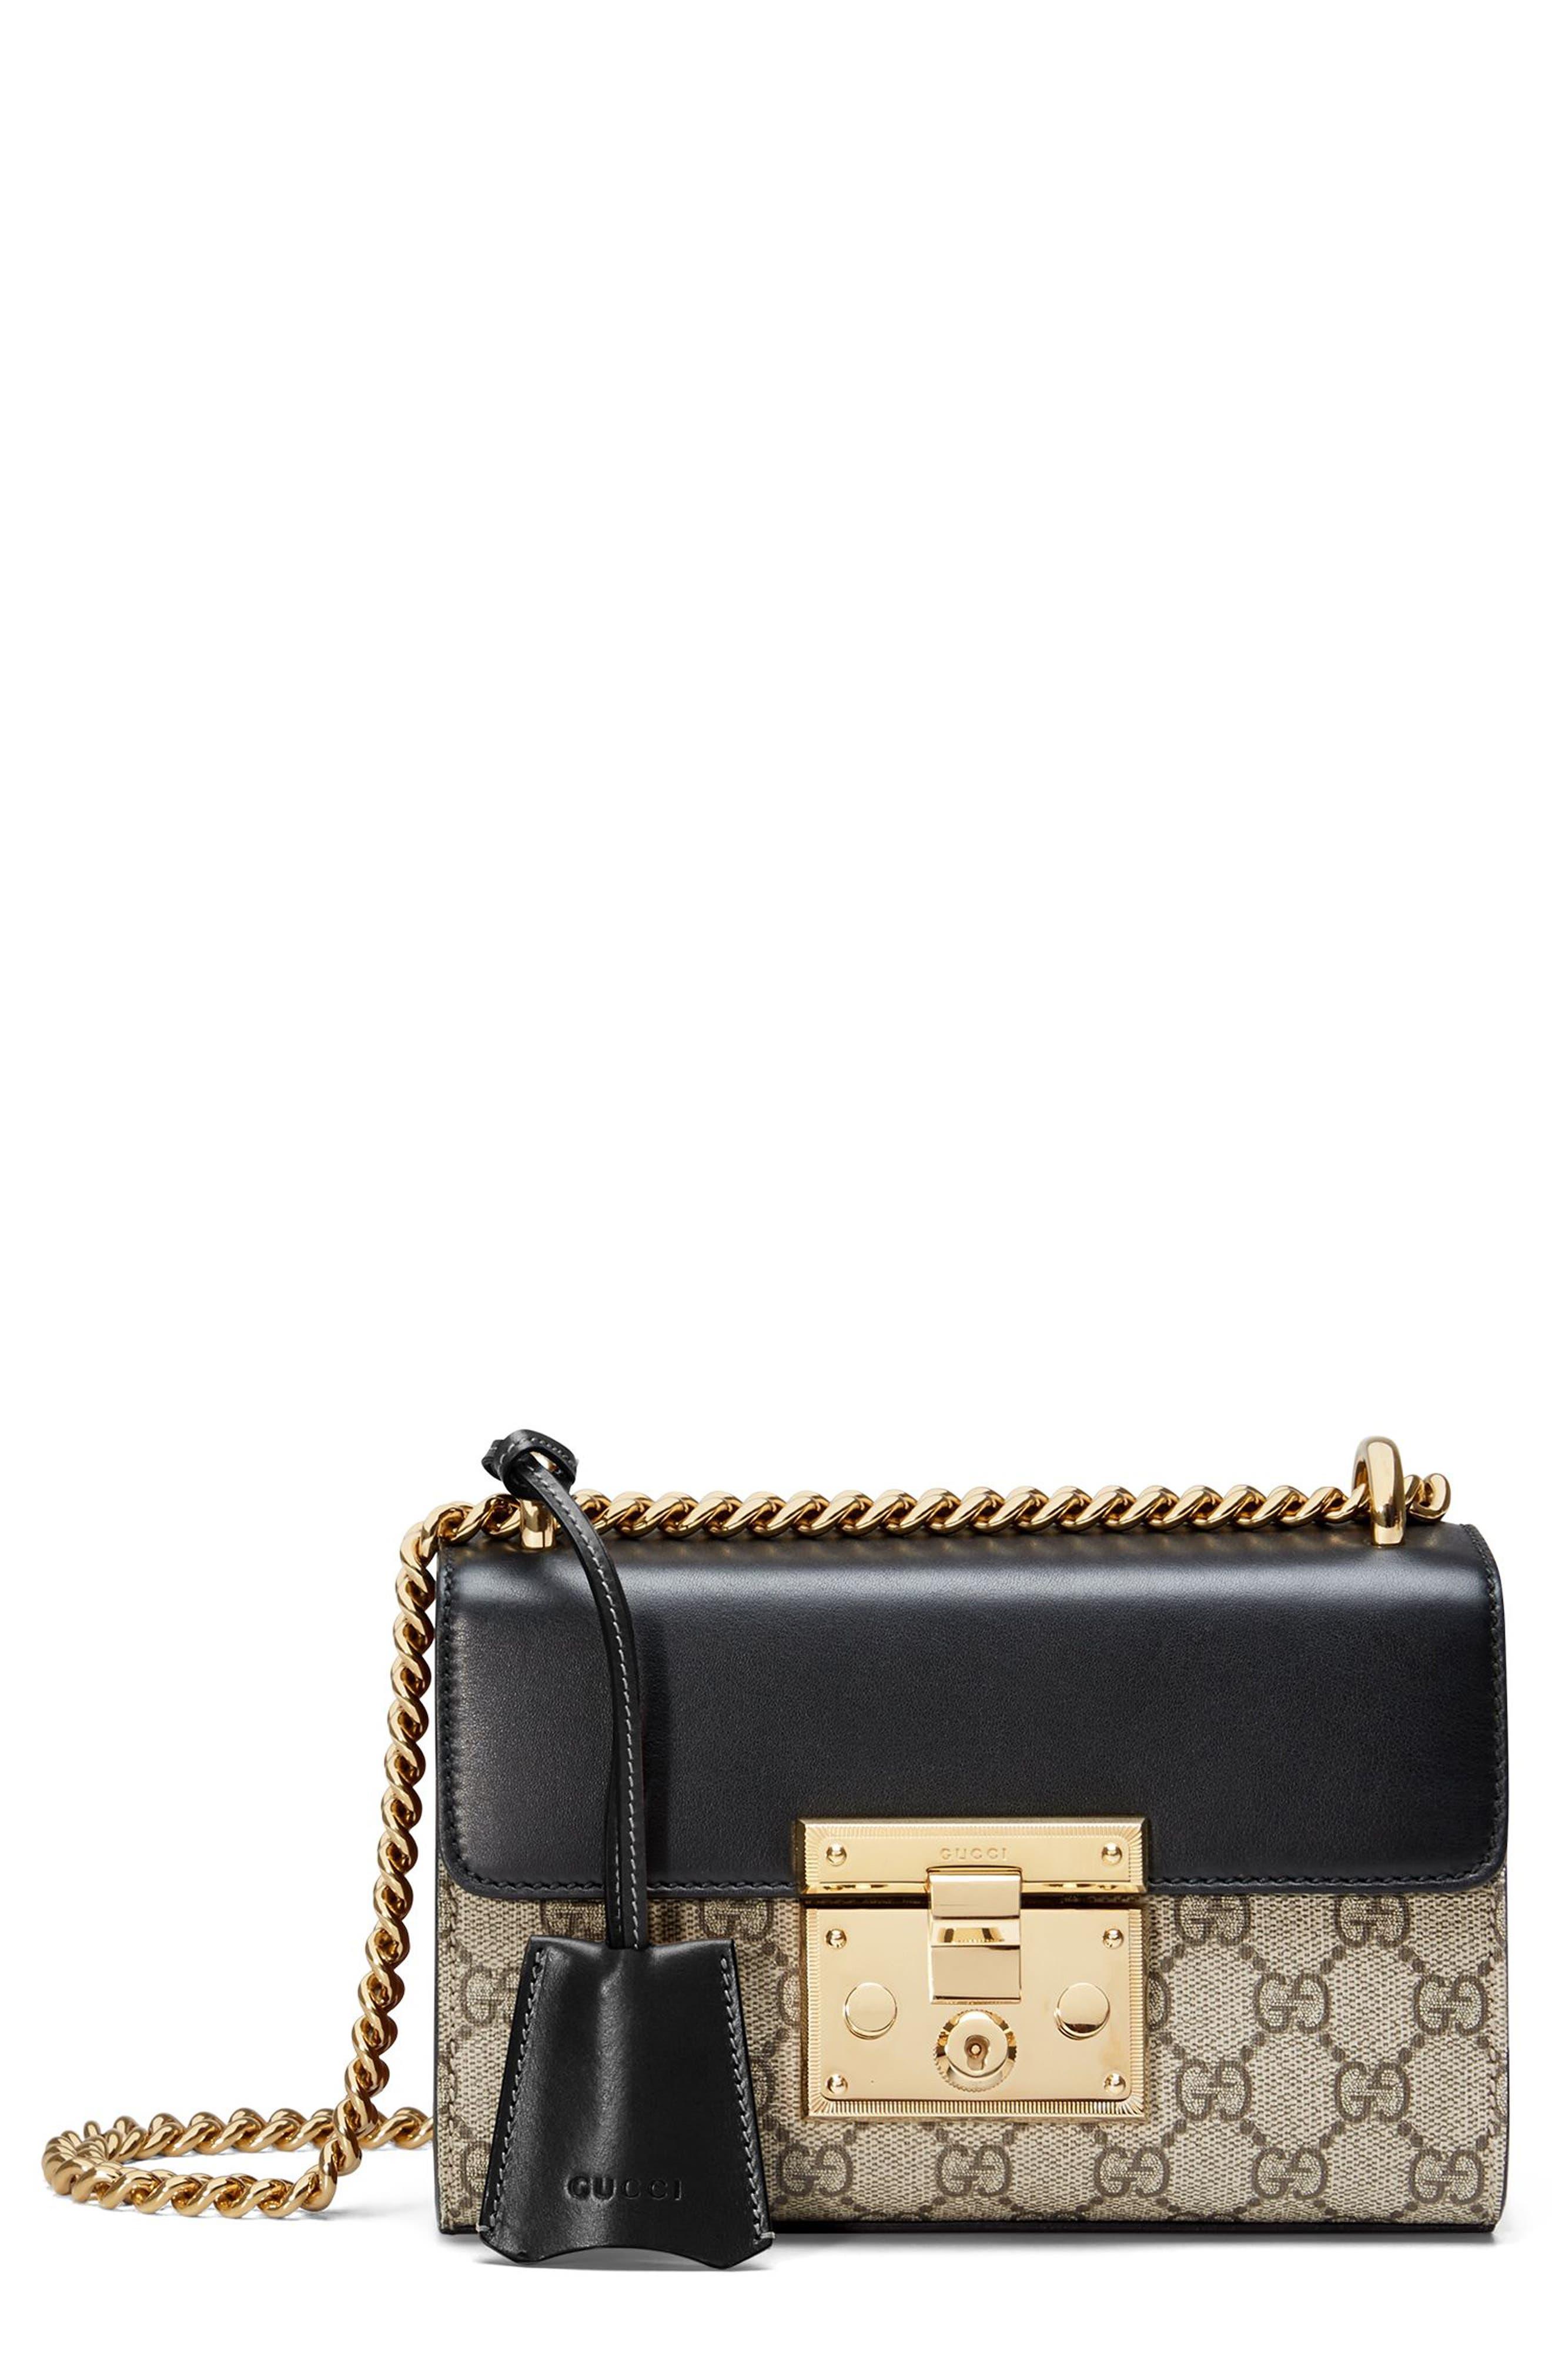 GUCCI Small Padlock GG Supreme Canvas & Leather Shoulder Bag, Main, color, MOON/TOSCANO